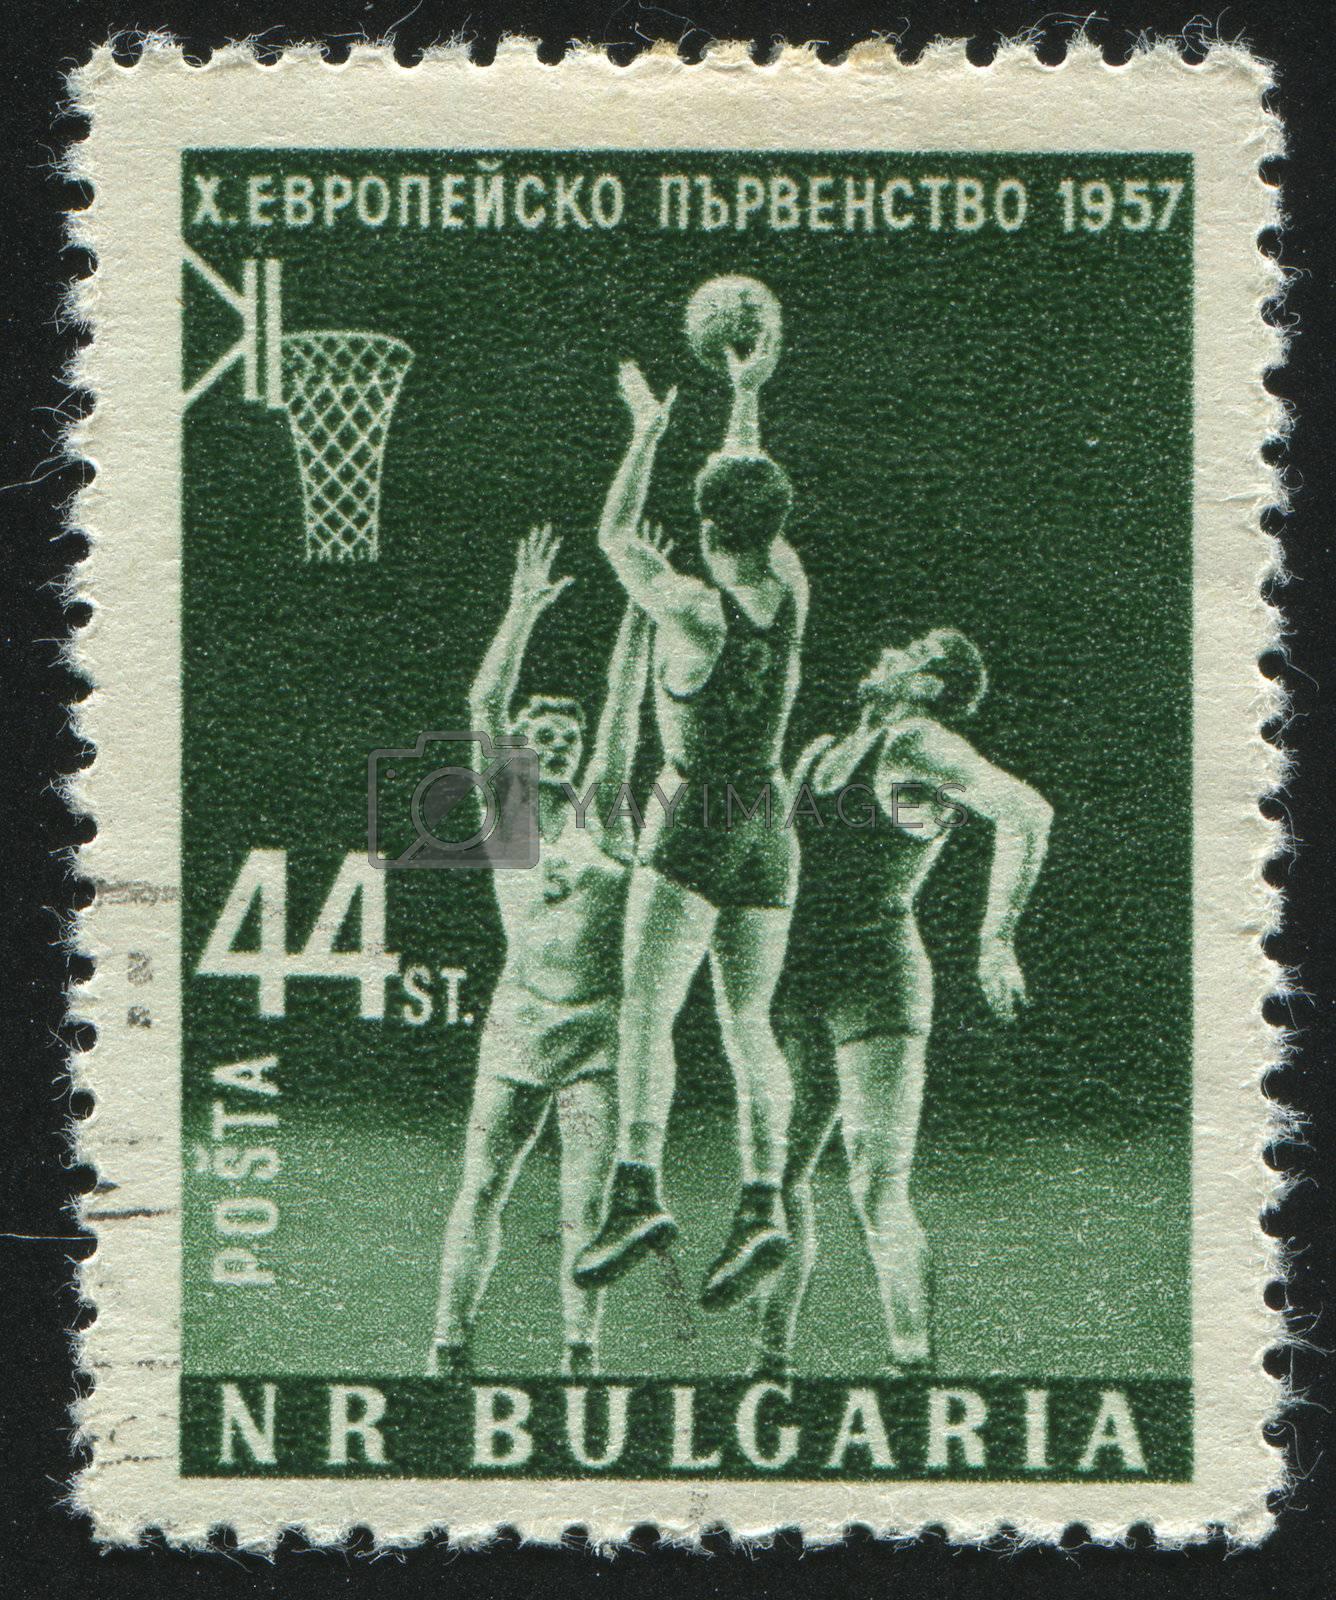 BULGARIA - CIRCA 1957: stamp printed by Bulgaria, shows basketball, circa 1957.